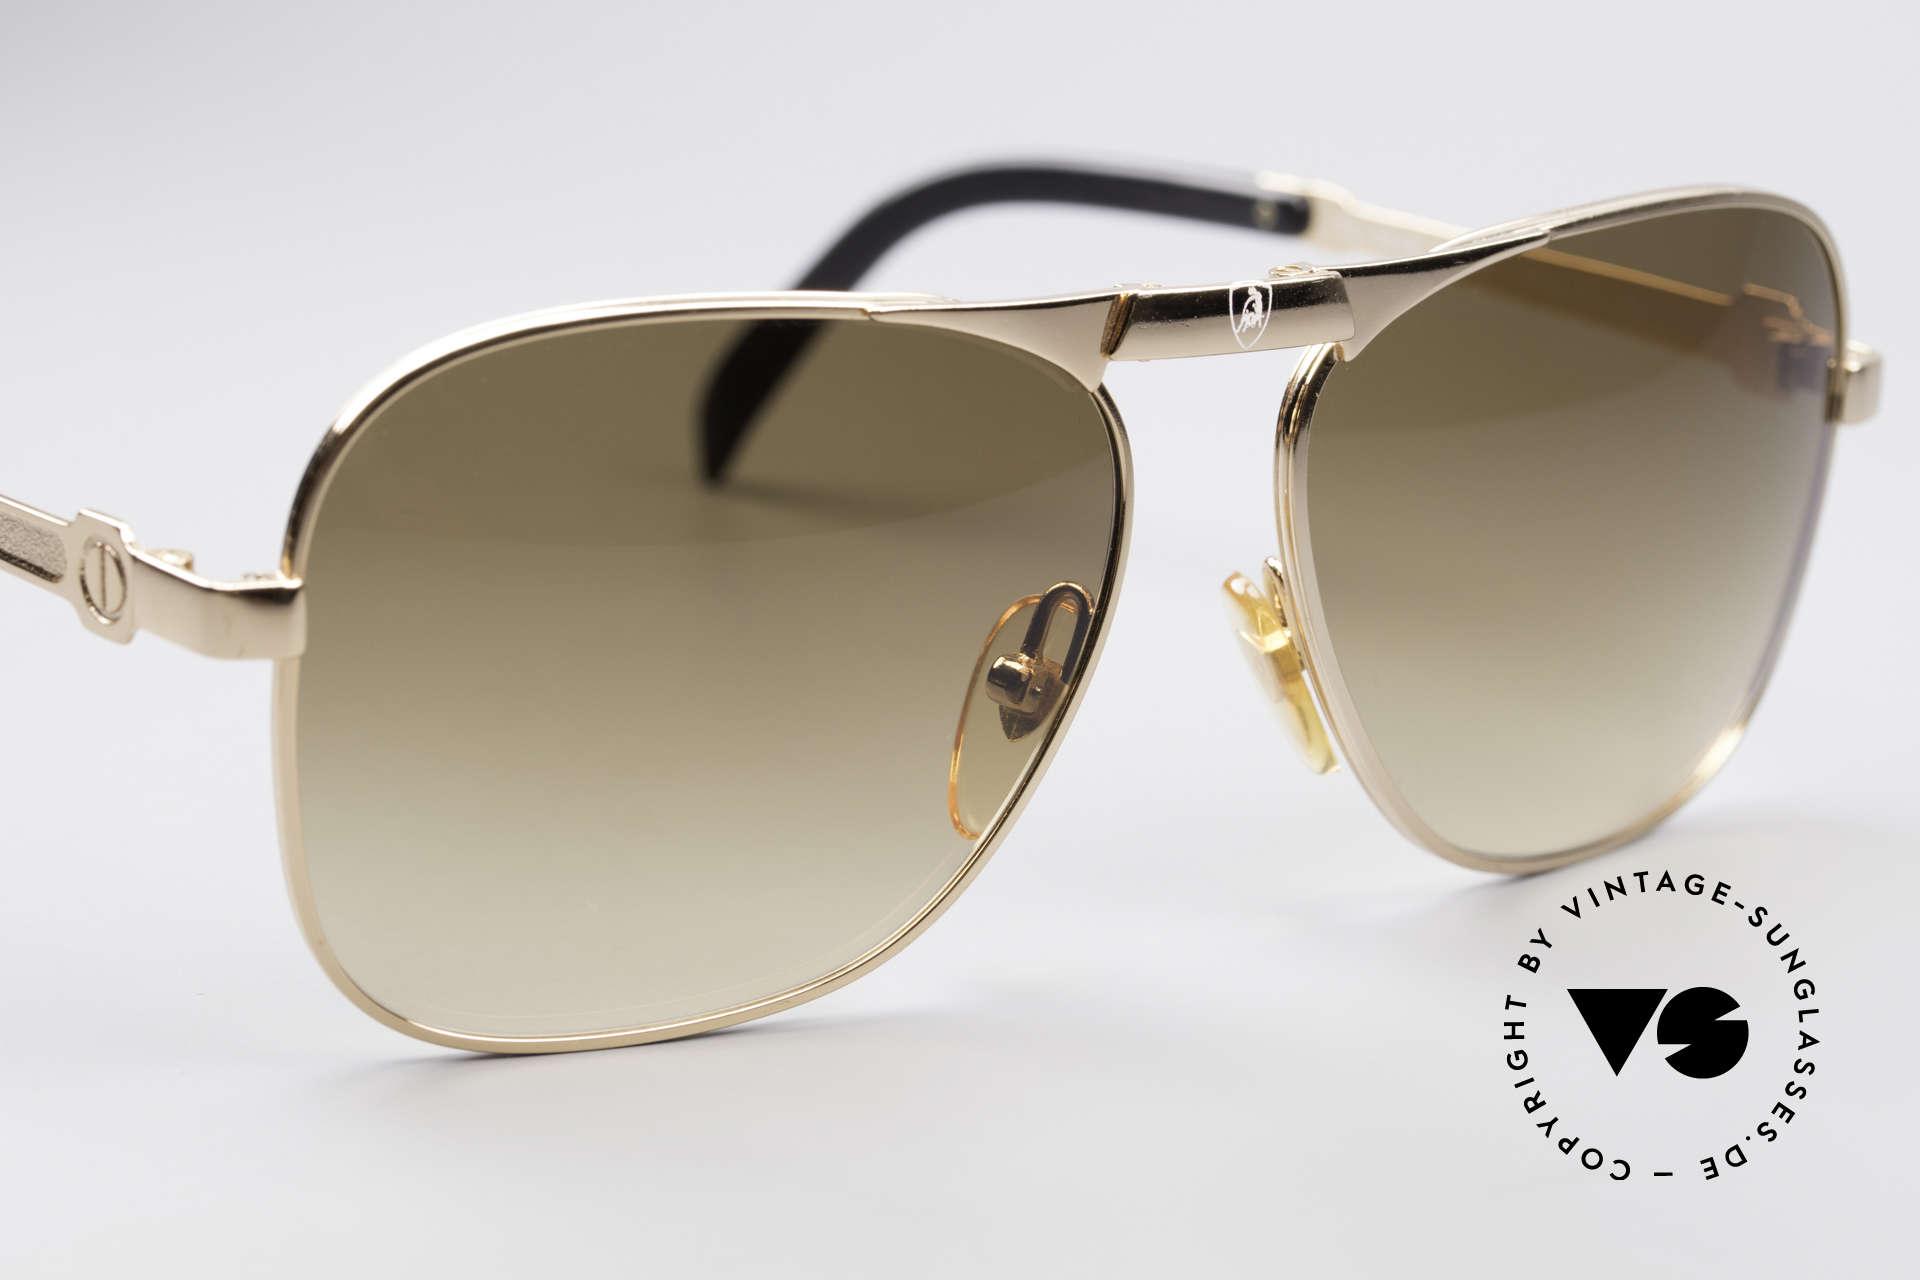 Lamborghini LT50/P 80's Folding Sunglasses, the world most famous 'raging bull' logo, on bridge & pads, Made for Men